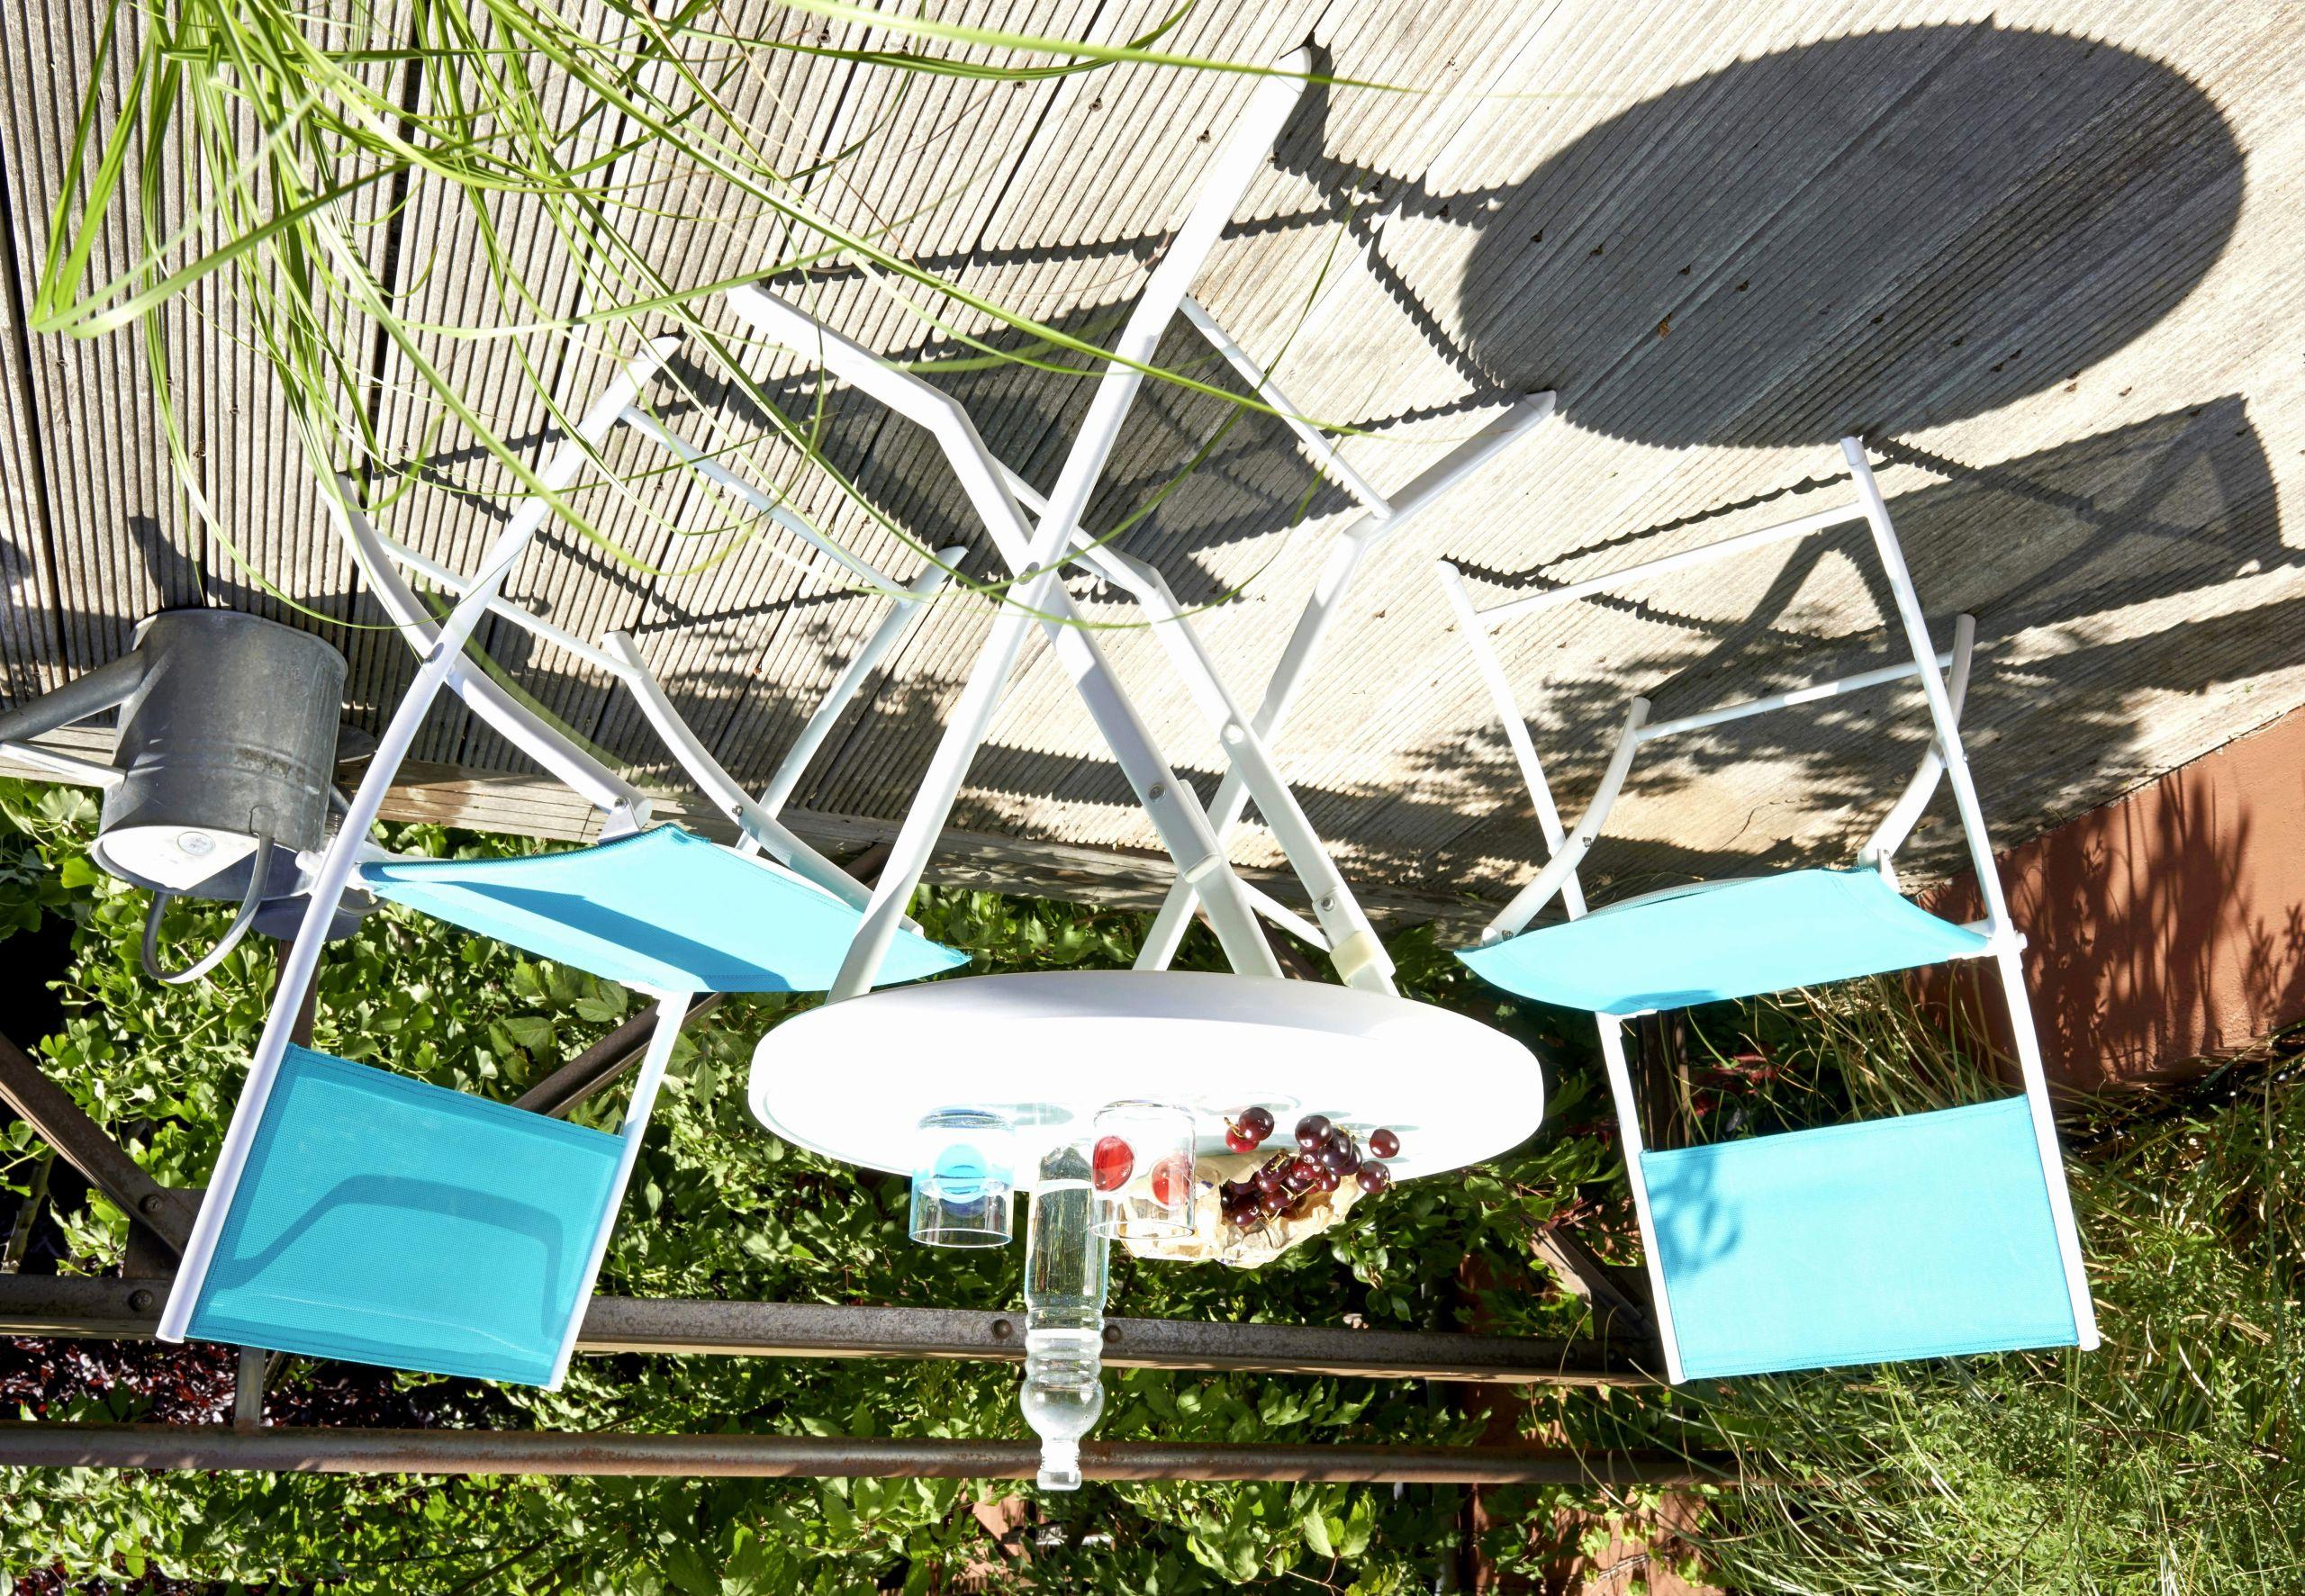 chaise de jardin castorama beau 30 moyen fontaine de jardin castorama of chaise de jardin castorama